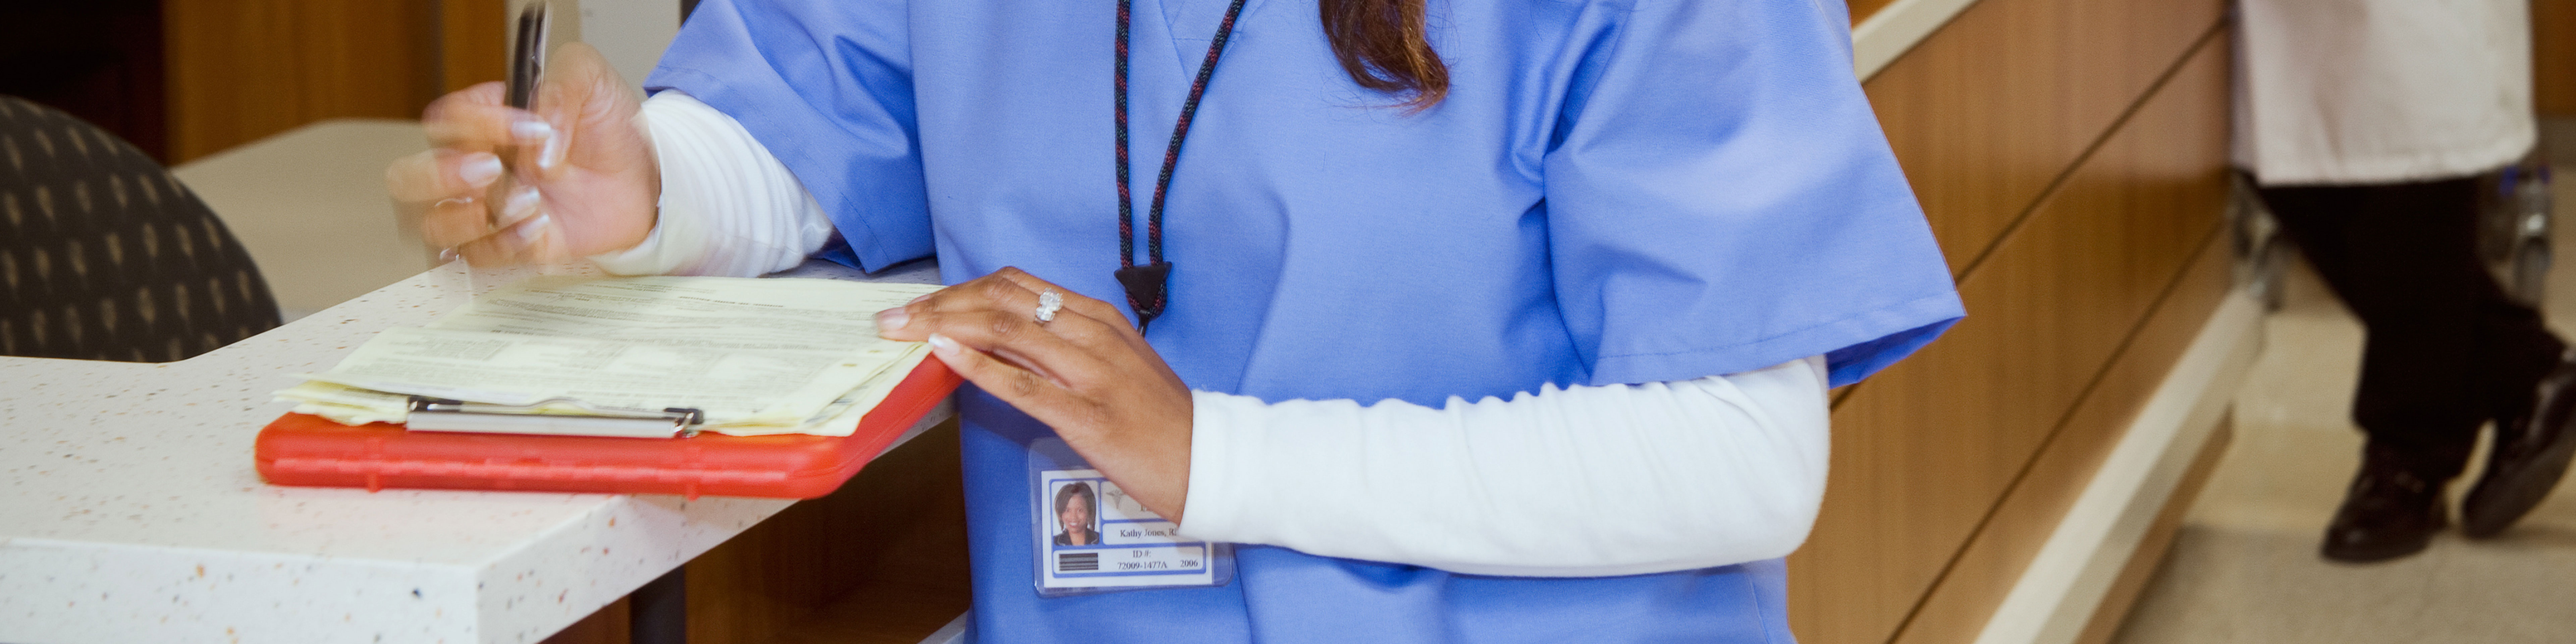 Enhancing Care Through Core Measures